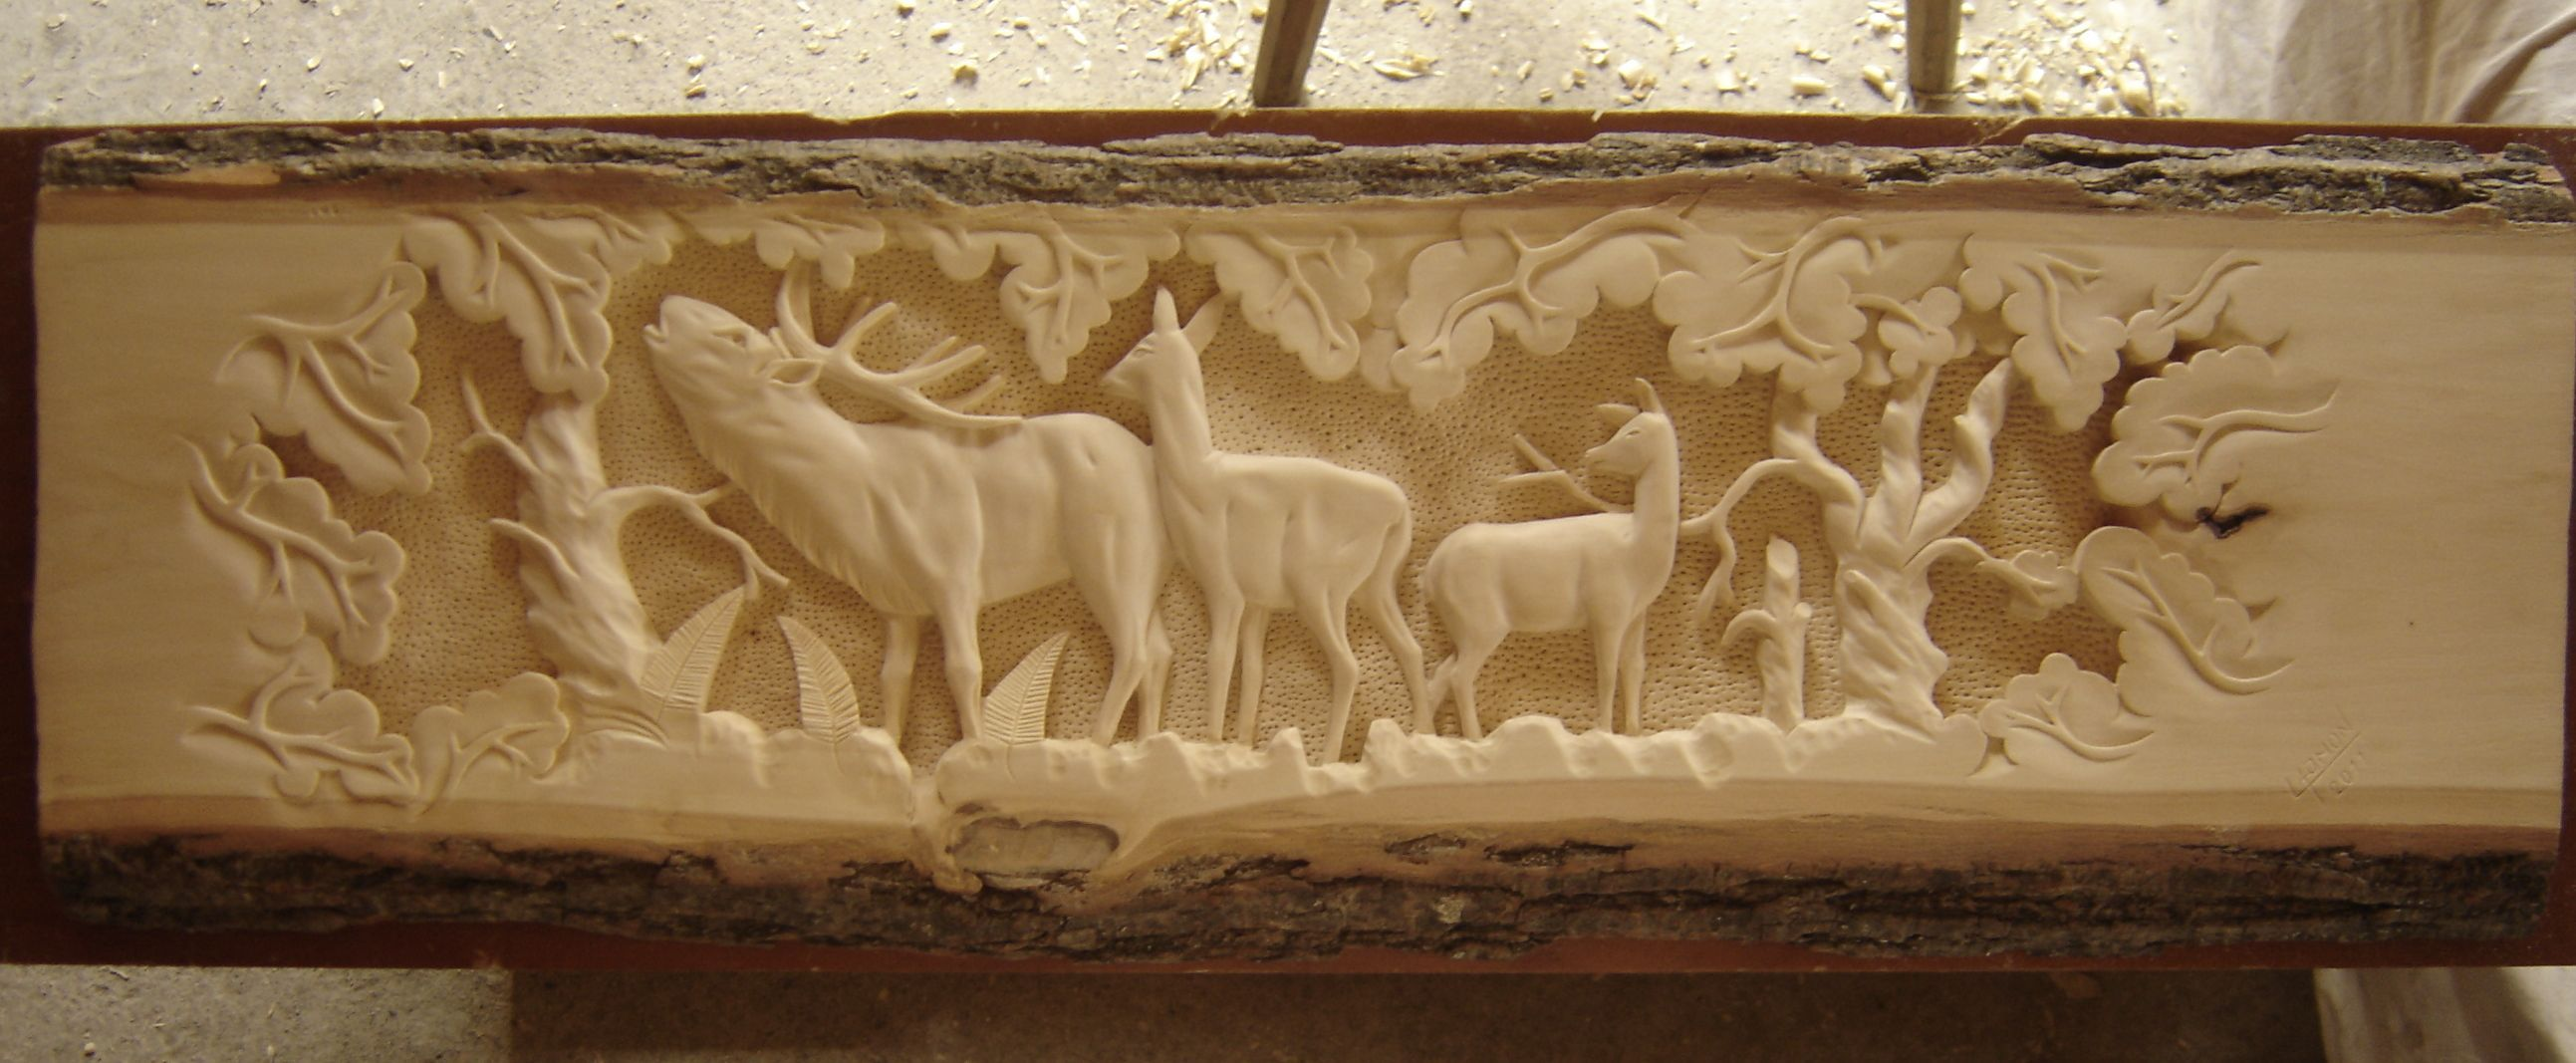 Drevorezba plastiky jeleňa umenie z dreva